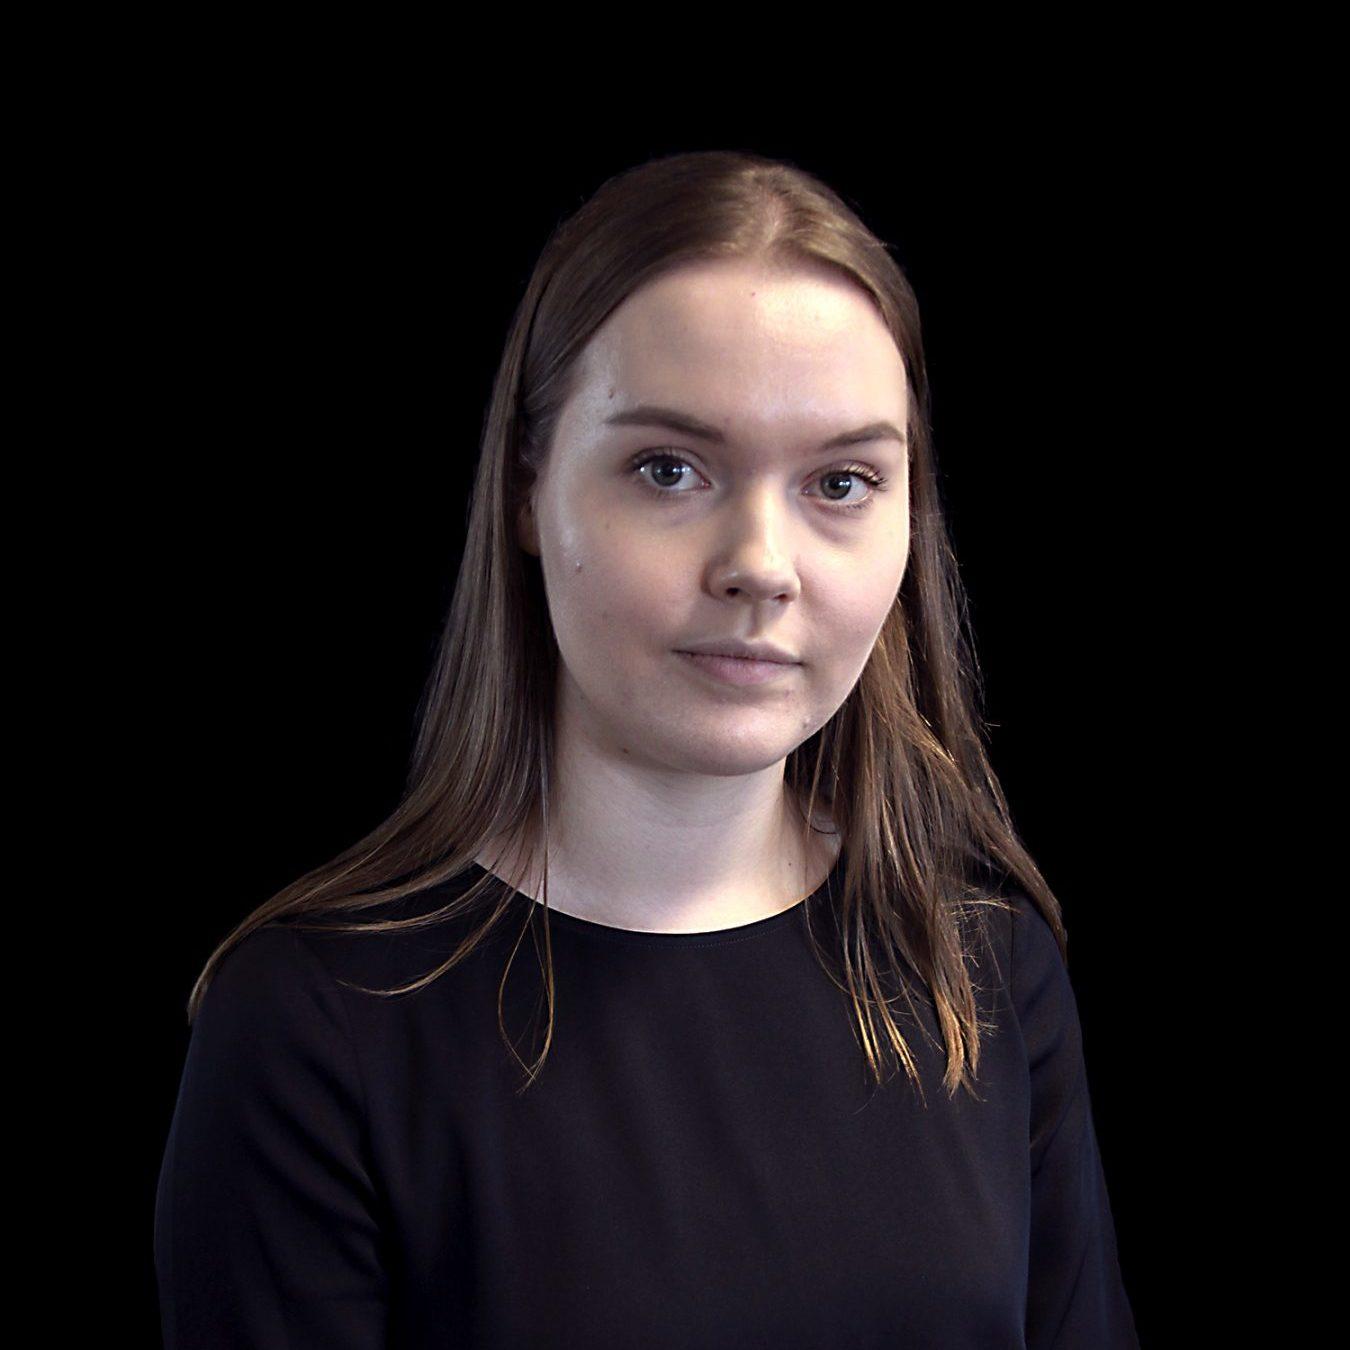 Anna Solantausta